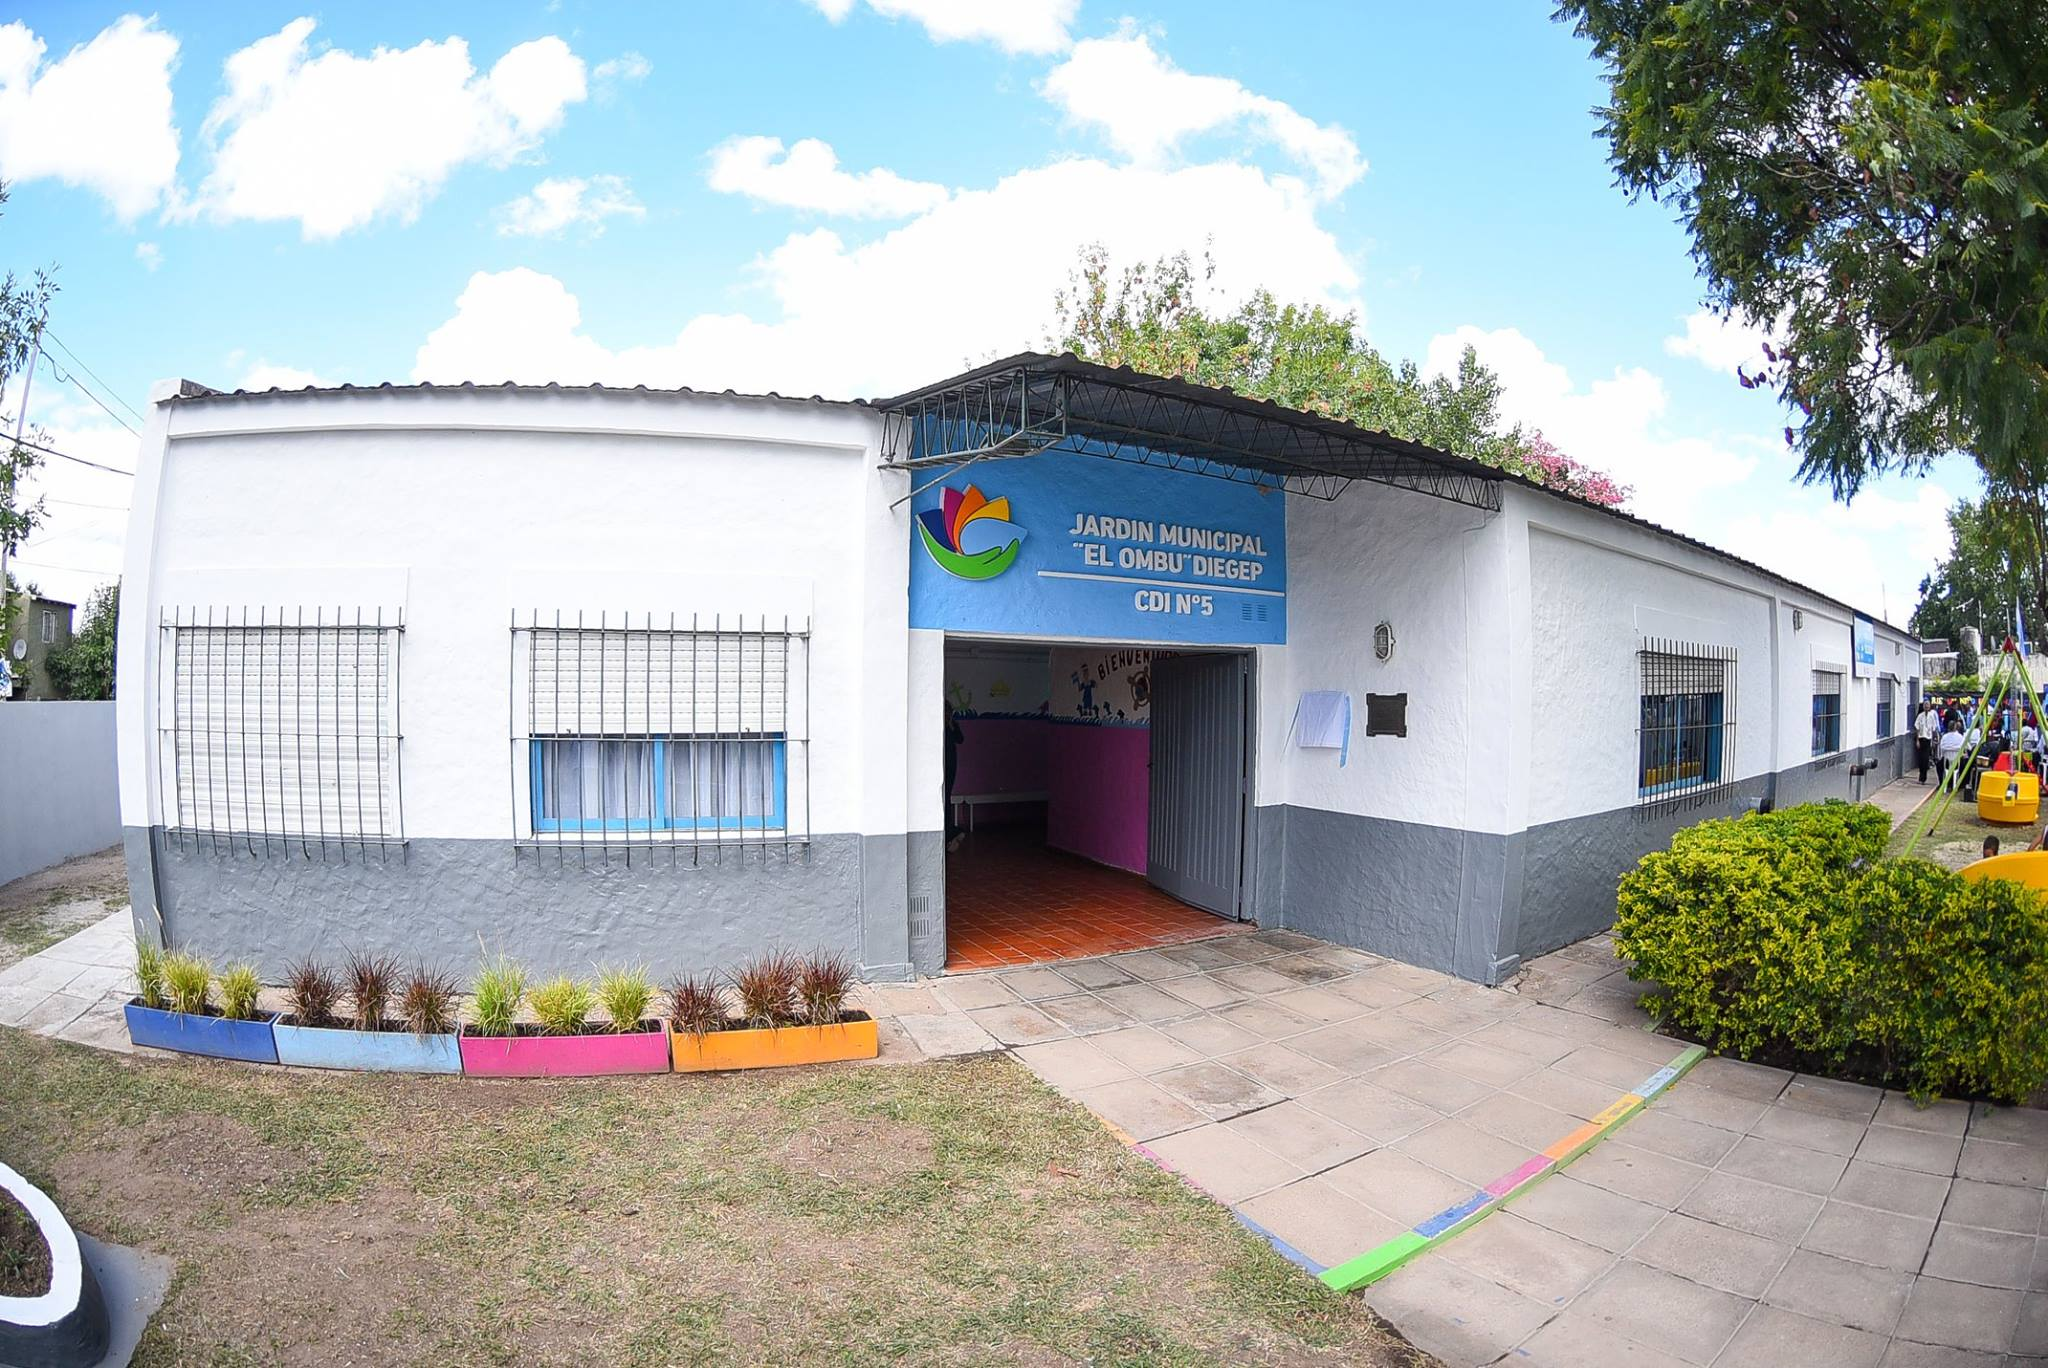 JardinMunicipalElOmbu